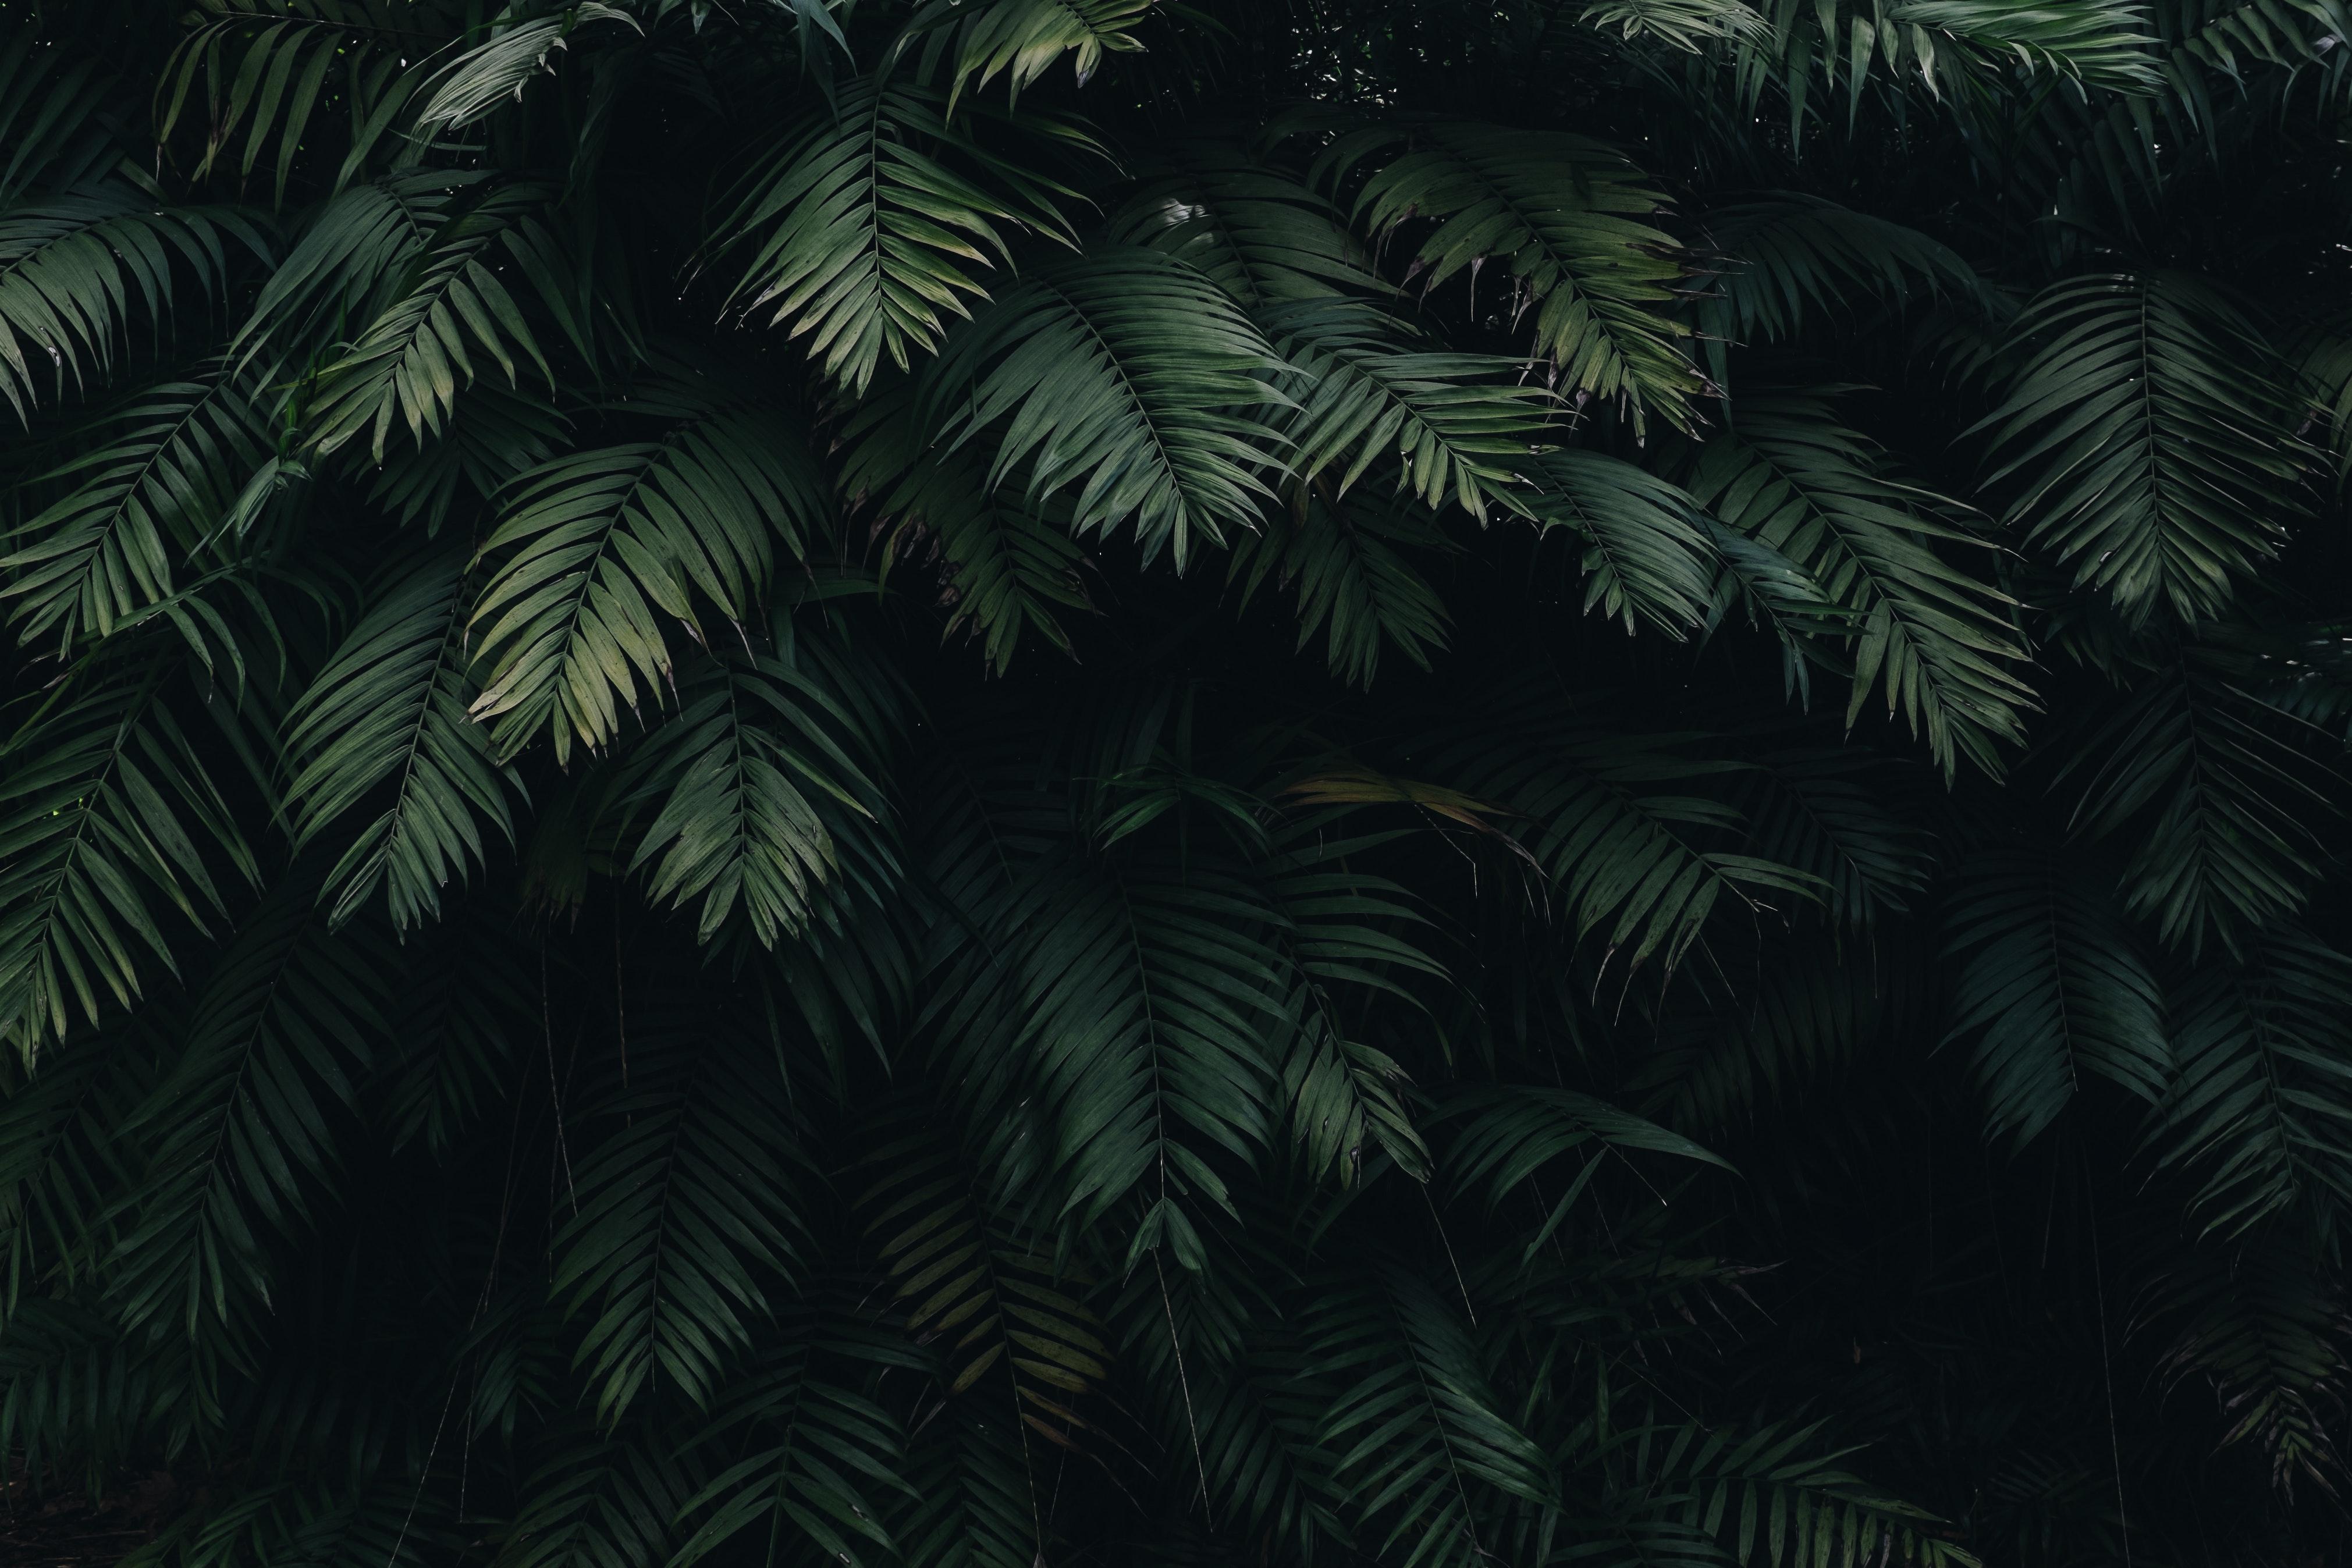 Ac96 Wallpaper Apple Iphone6 Plus Ios8 Flower Green: 1000+ Amazing Trees Photos · Pexels · Free Stock Photos